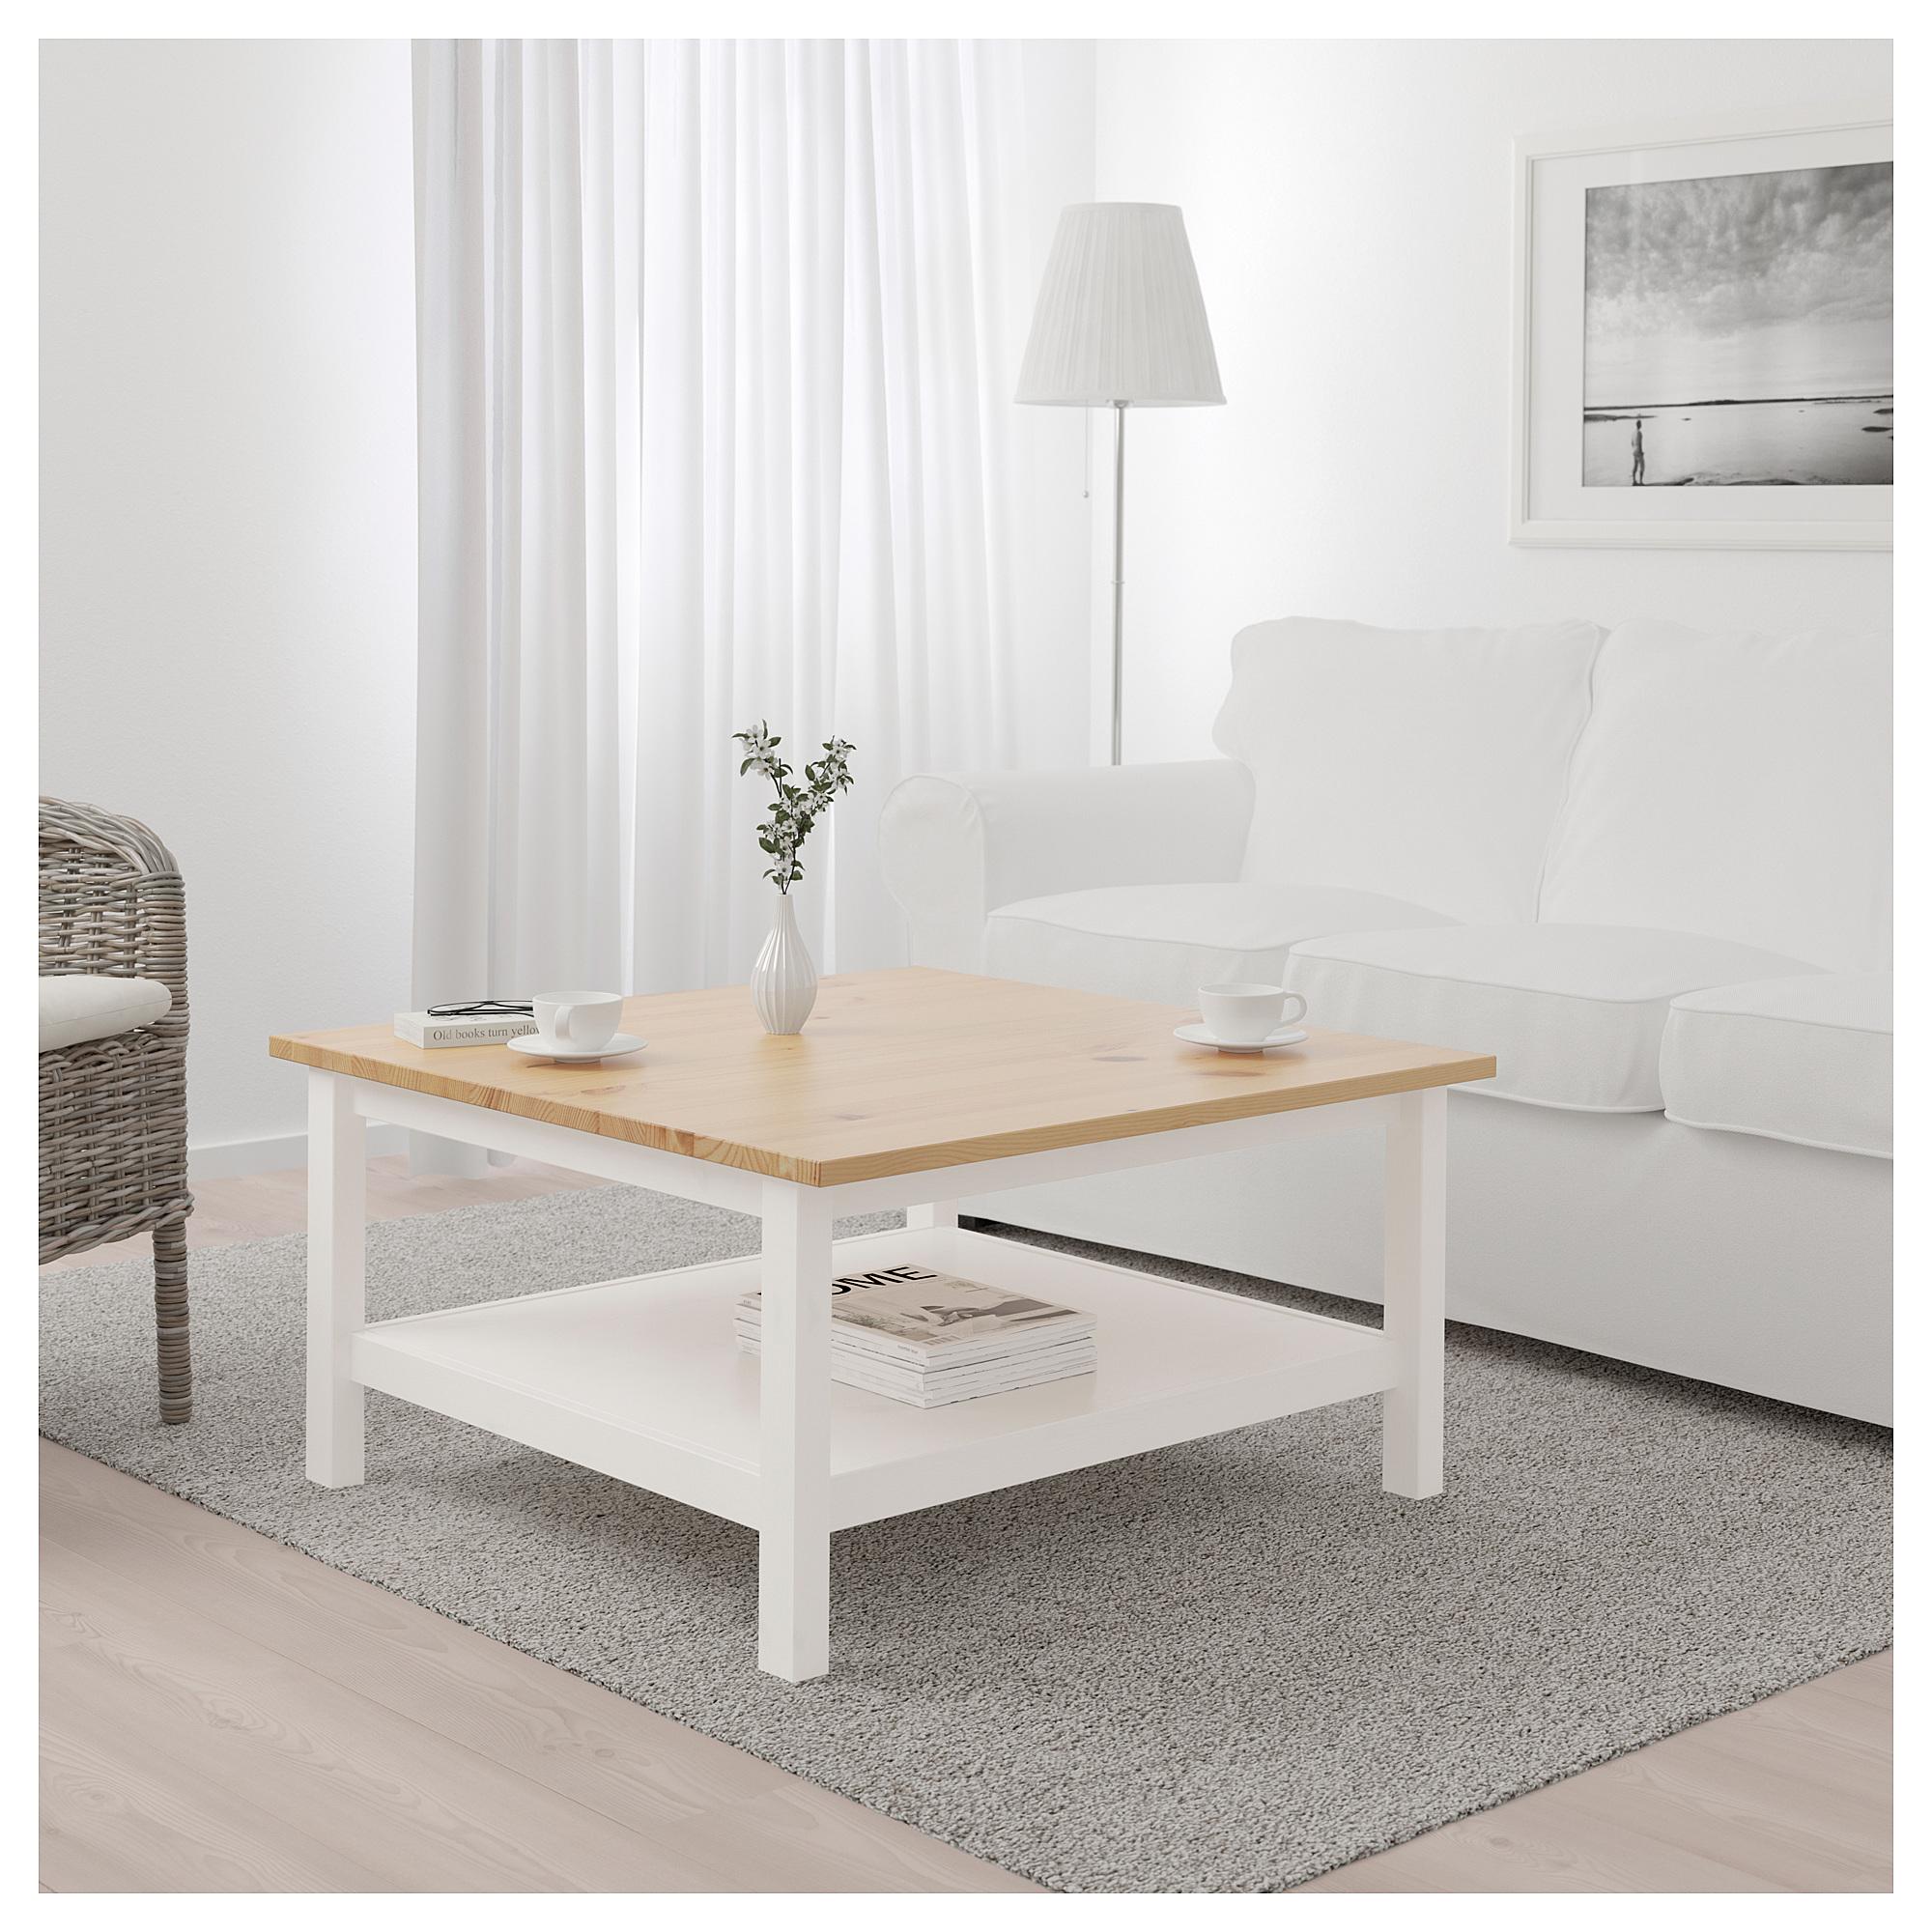 Ikea Hemnes Coffee Table White Stain Light Brown